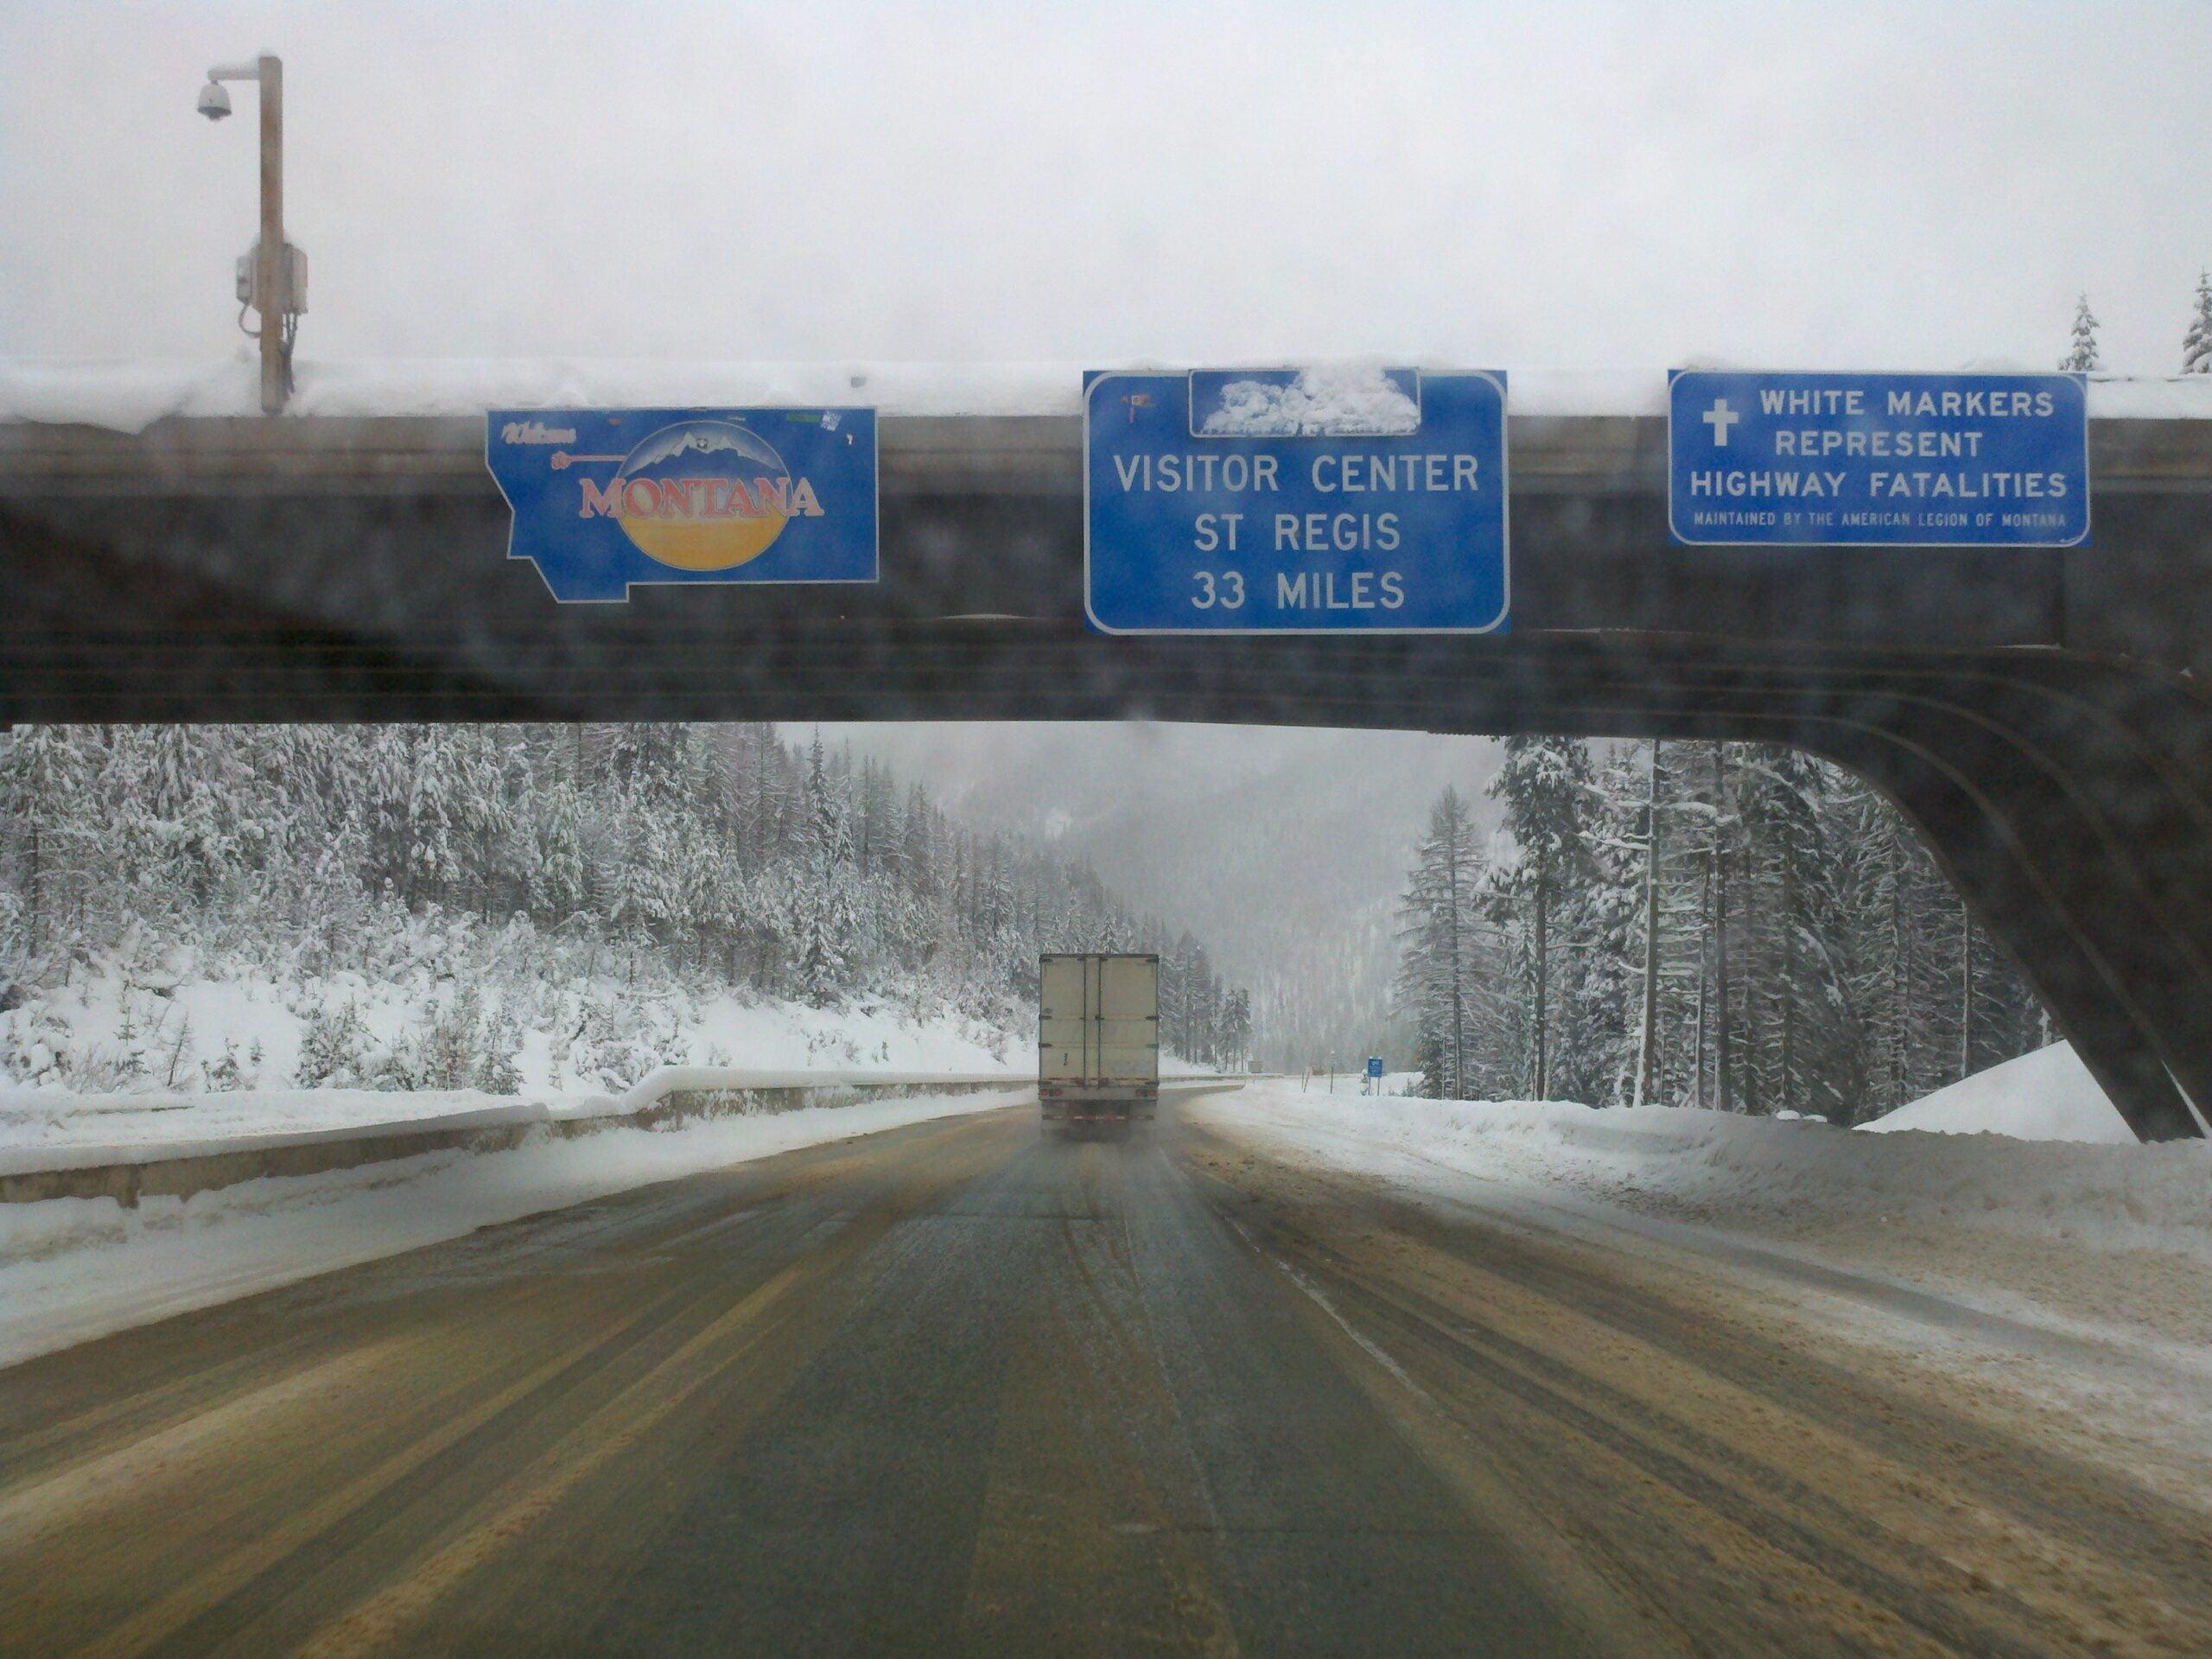 Road Trippin' to South Dakota